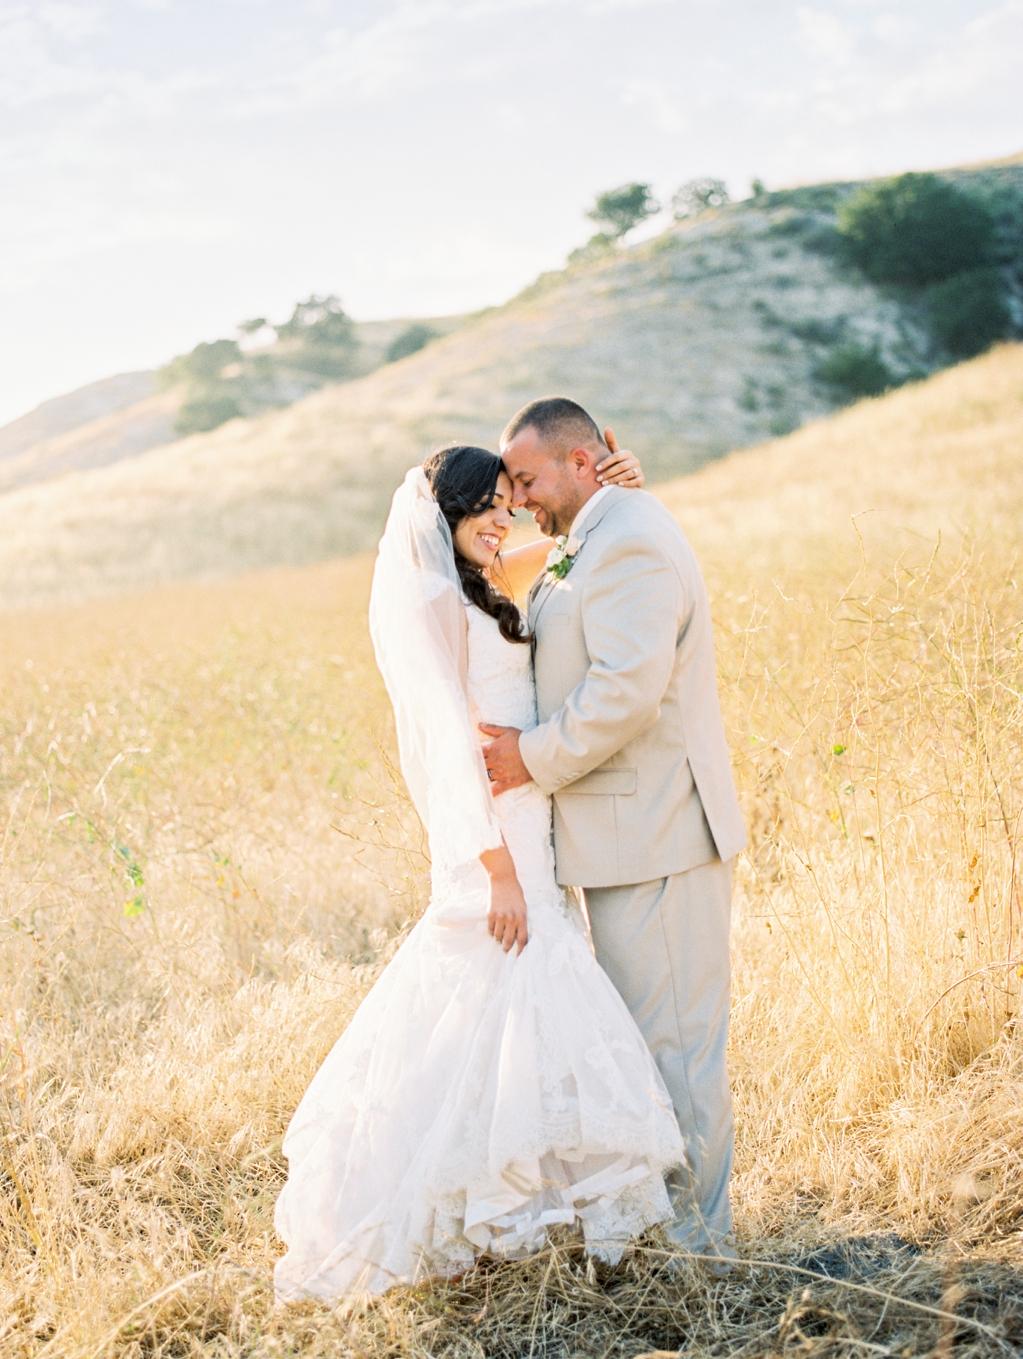 santa-ynez-wedding-mike-thezier-photography_0049.jpg